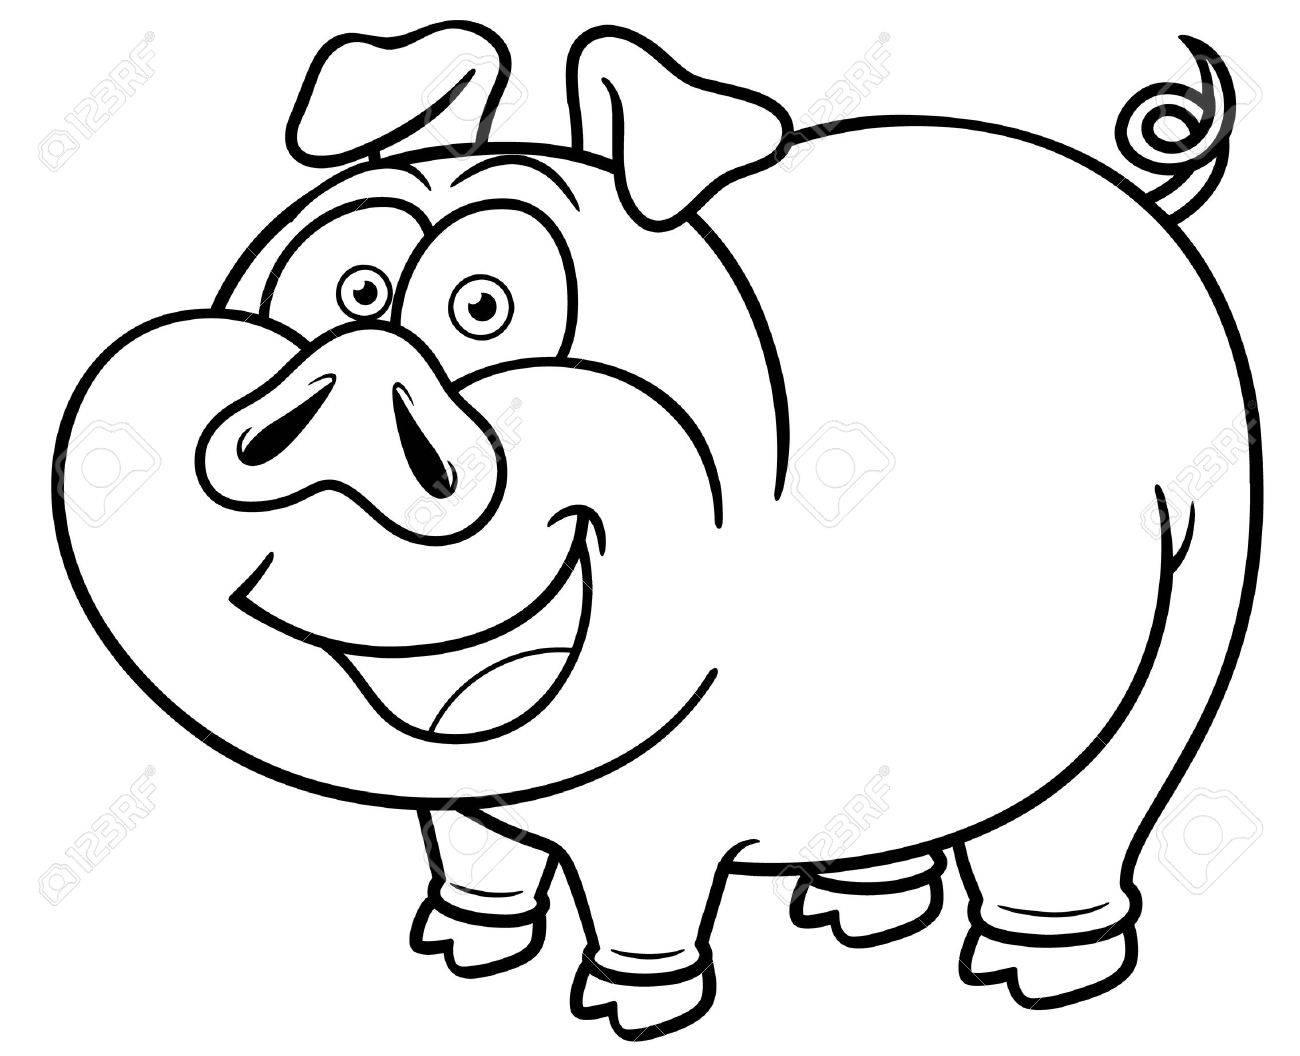 Vector Illustration Of Cartoon Pig - Coloring Book Royalty Free ...